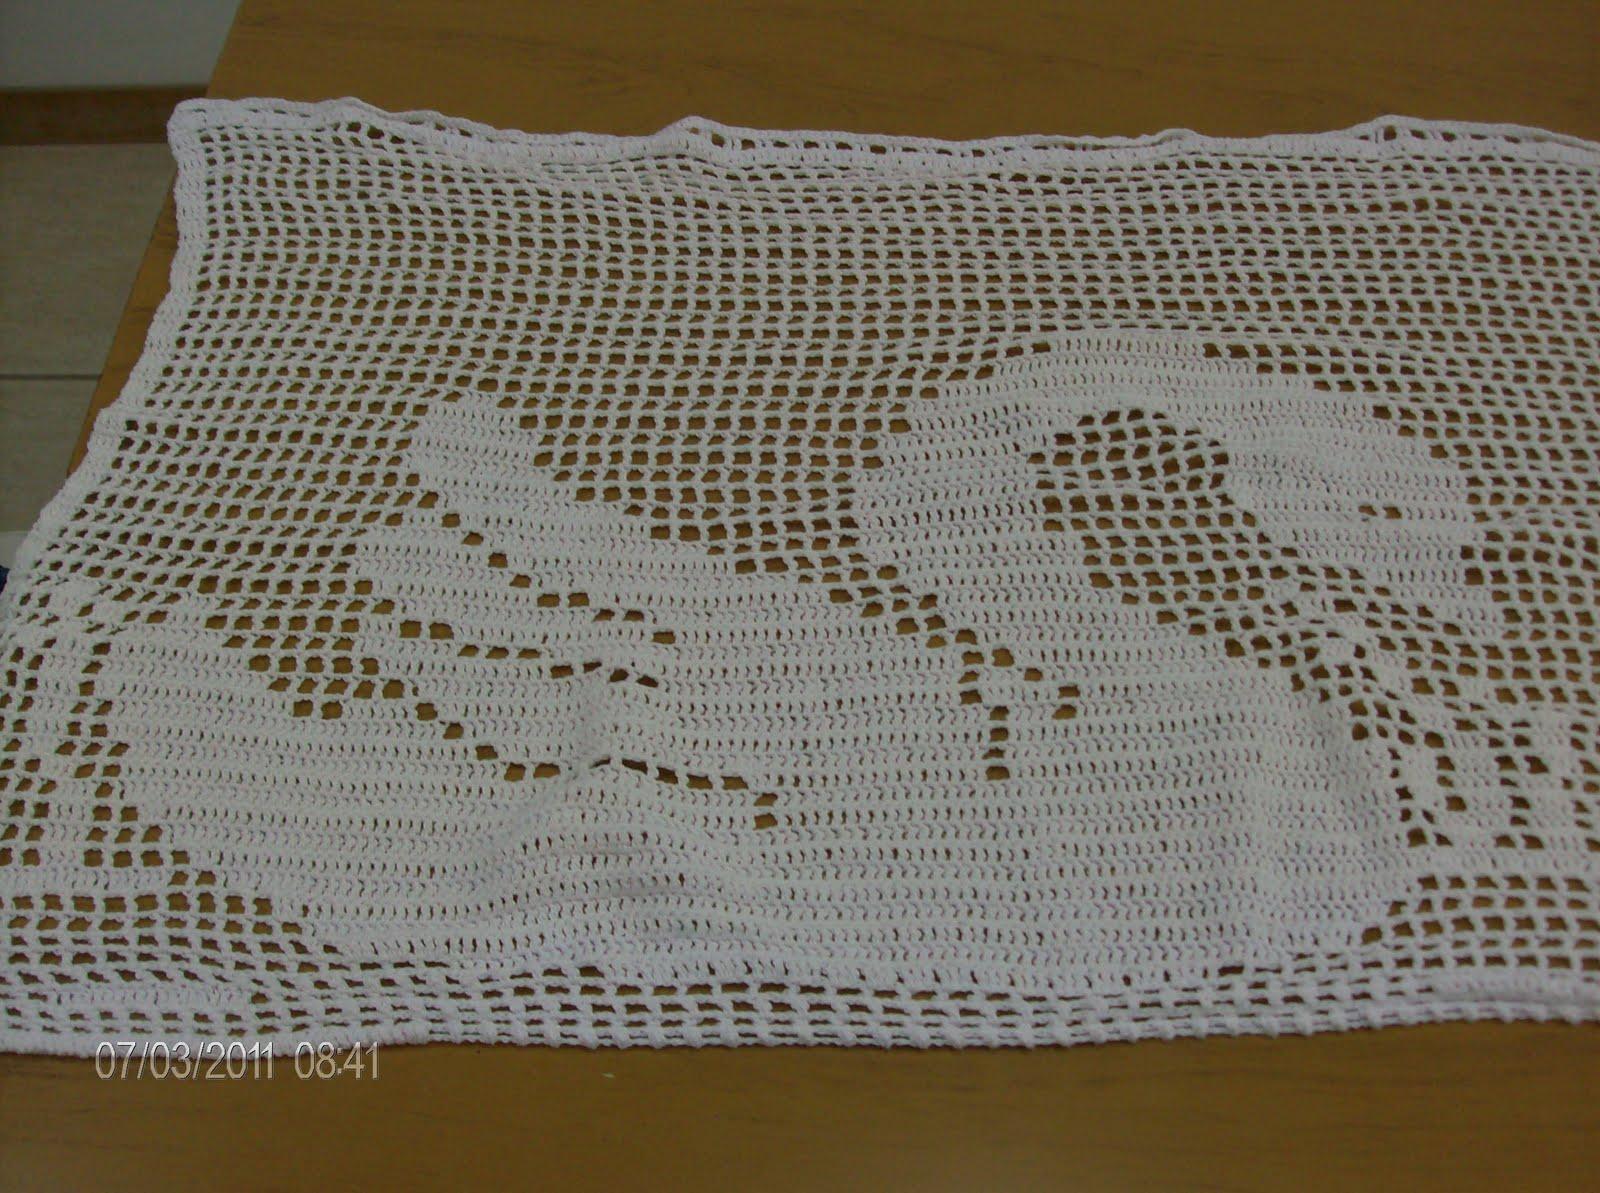 Moldes de cortinas al crochet imagui for Cortinas de gancho para cocina